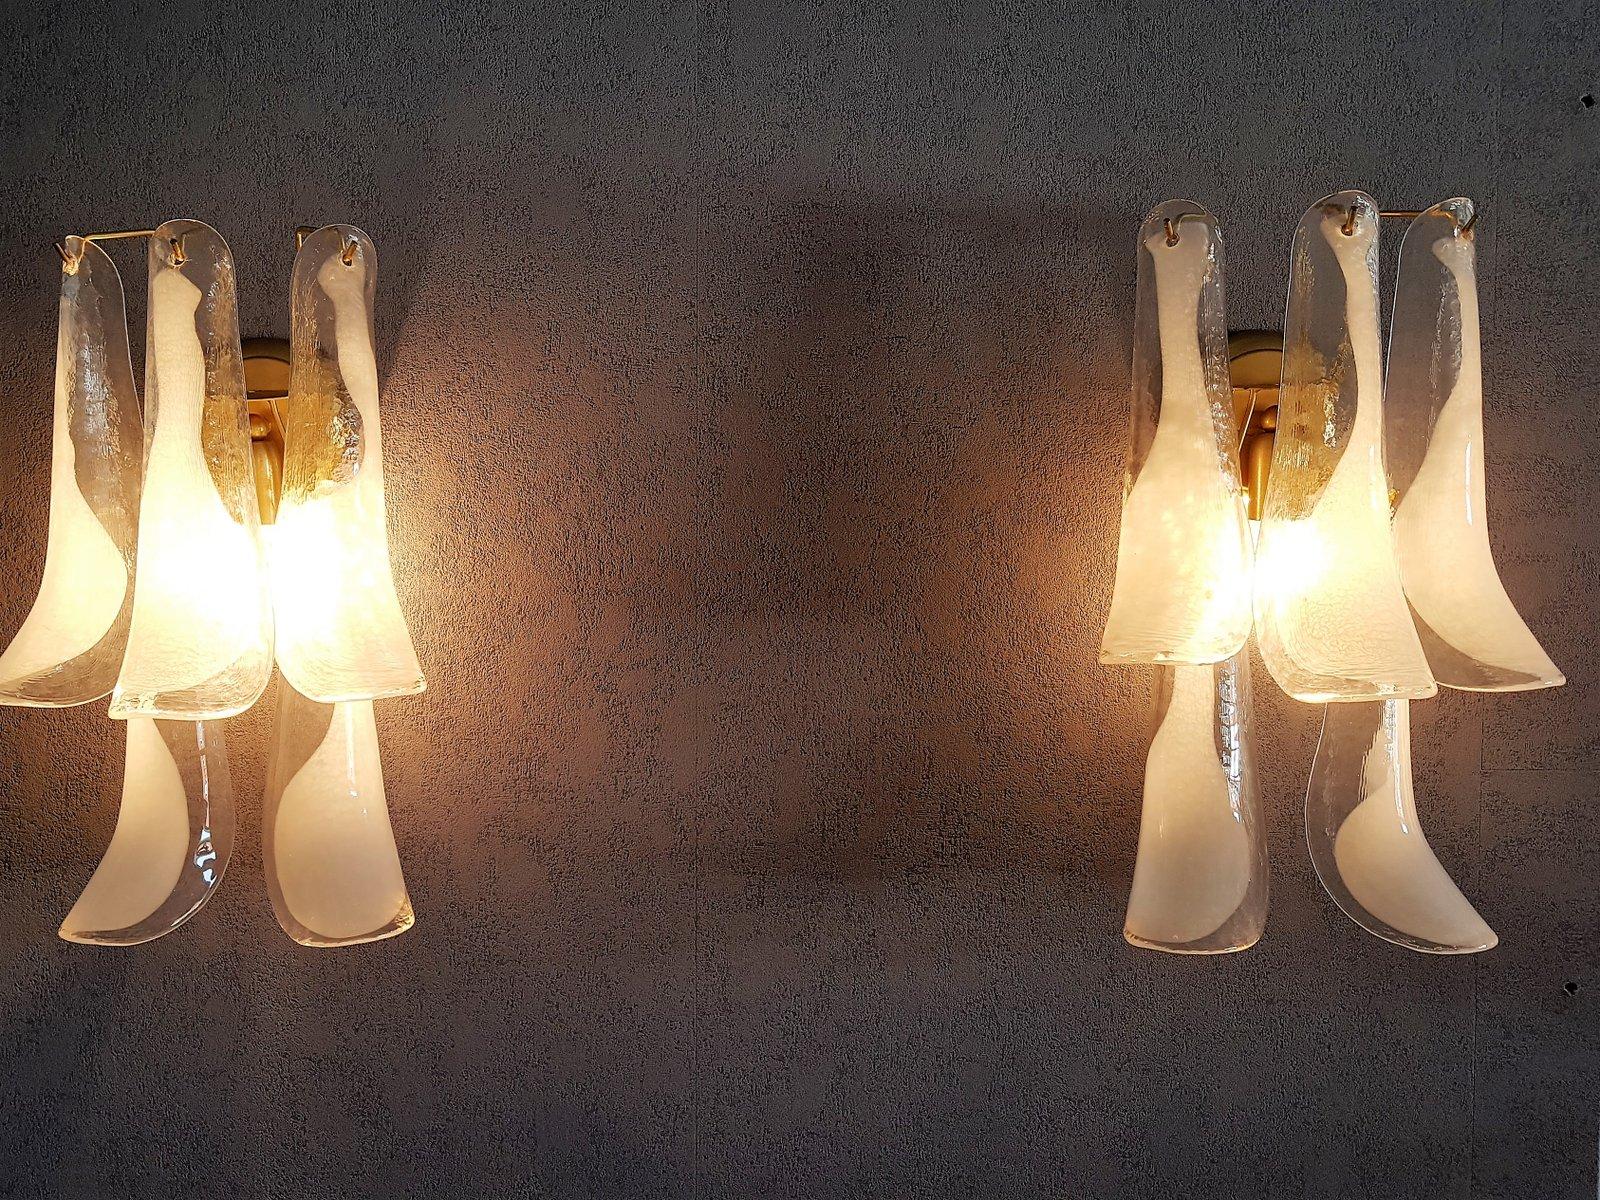 italienische vintage murano glas wandlampen von mazzega. Black Bedroom Furniture Sets. Home Design Ideas